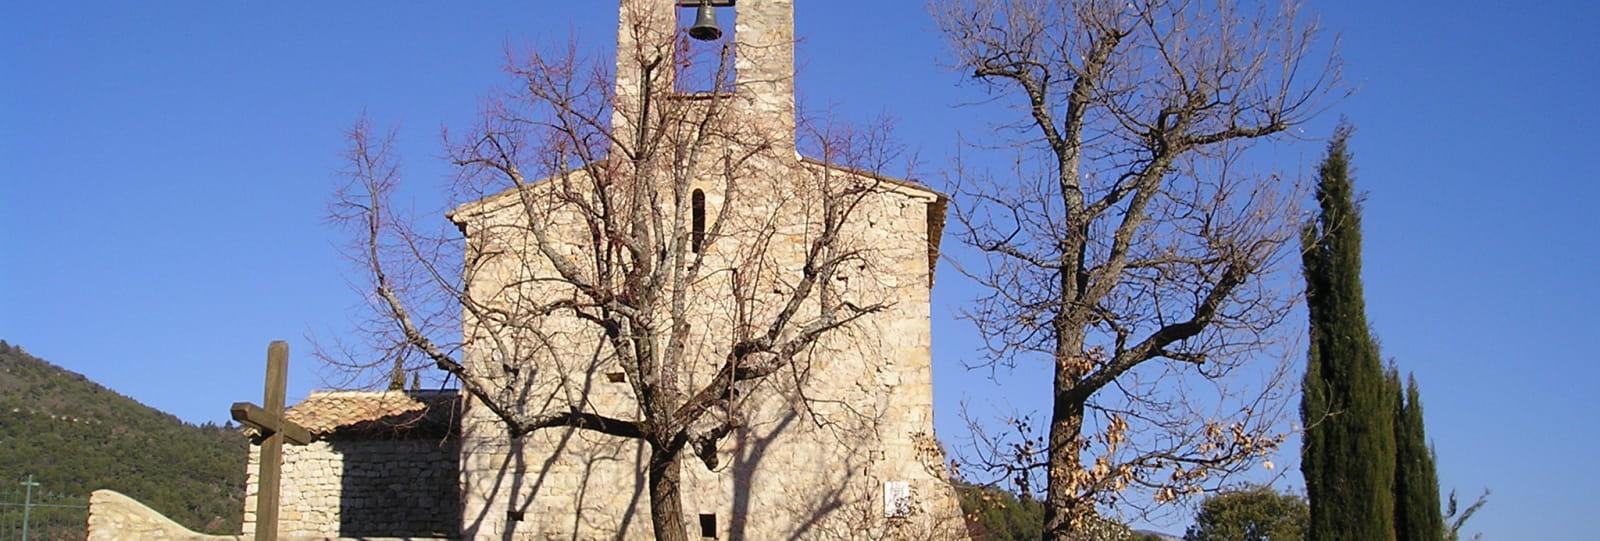 Notre-Dame des Aspirants